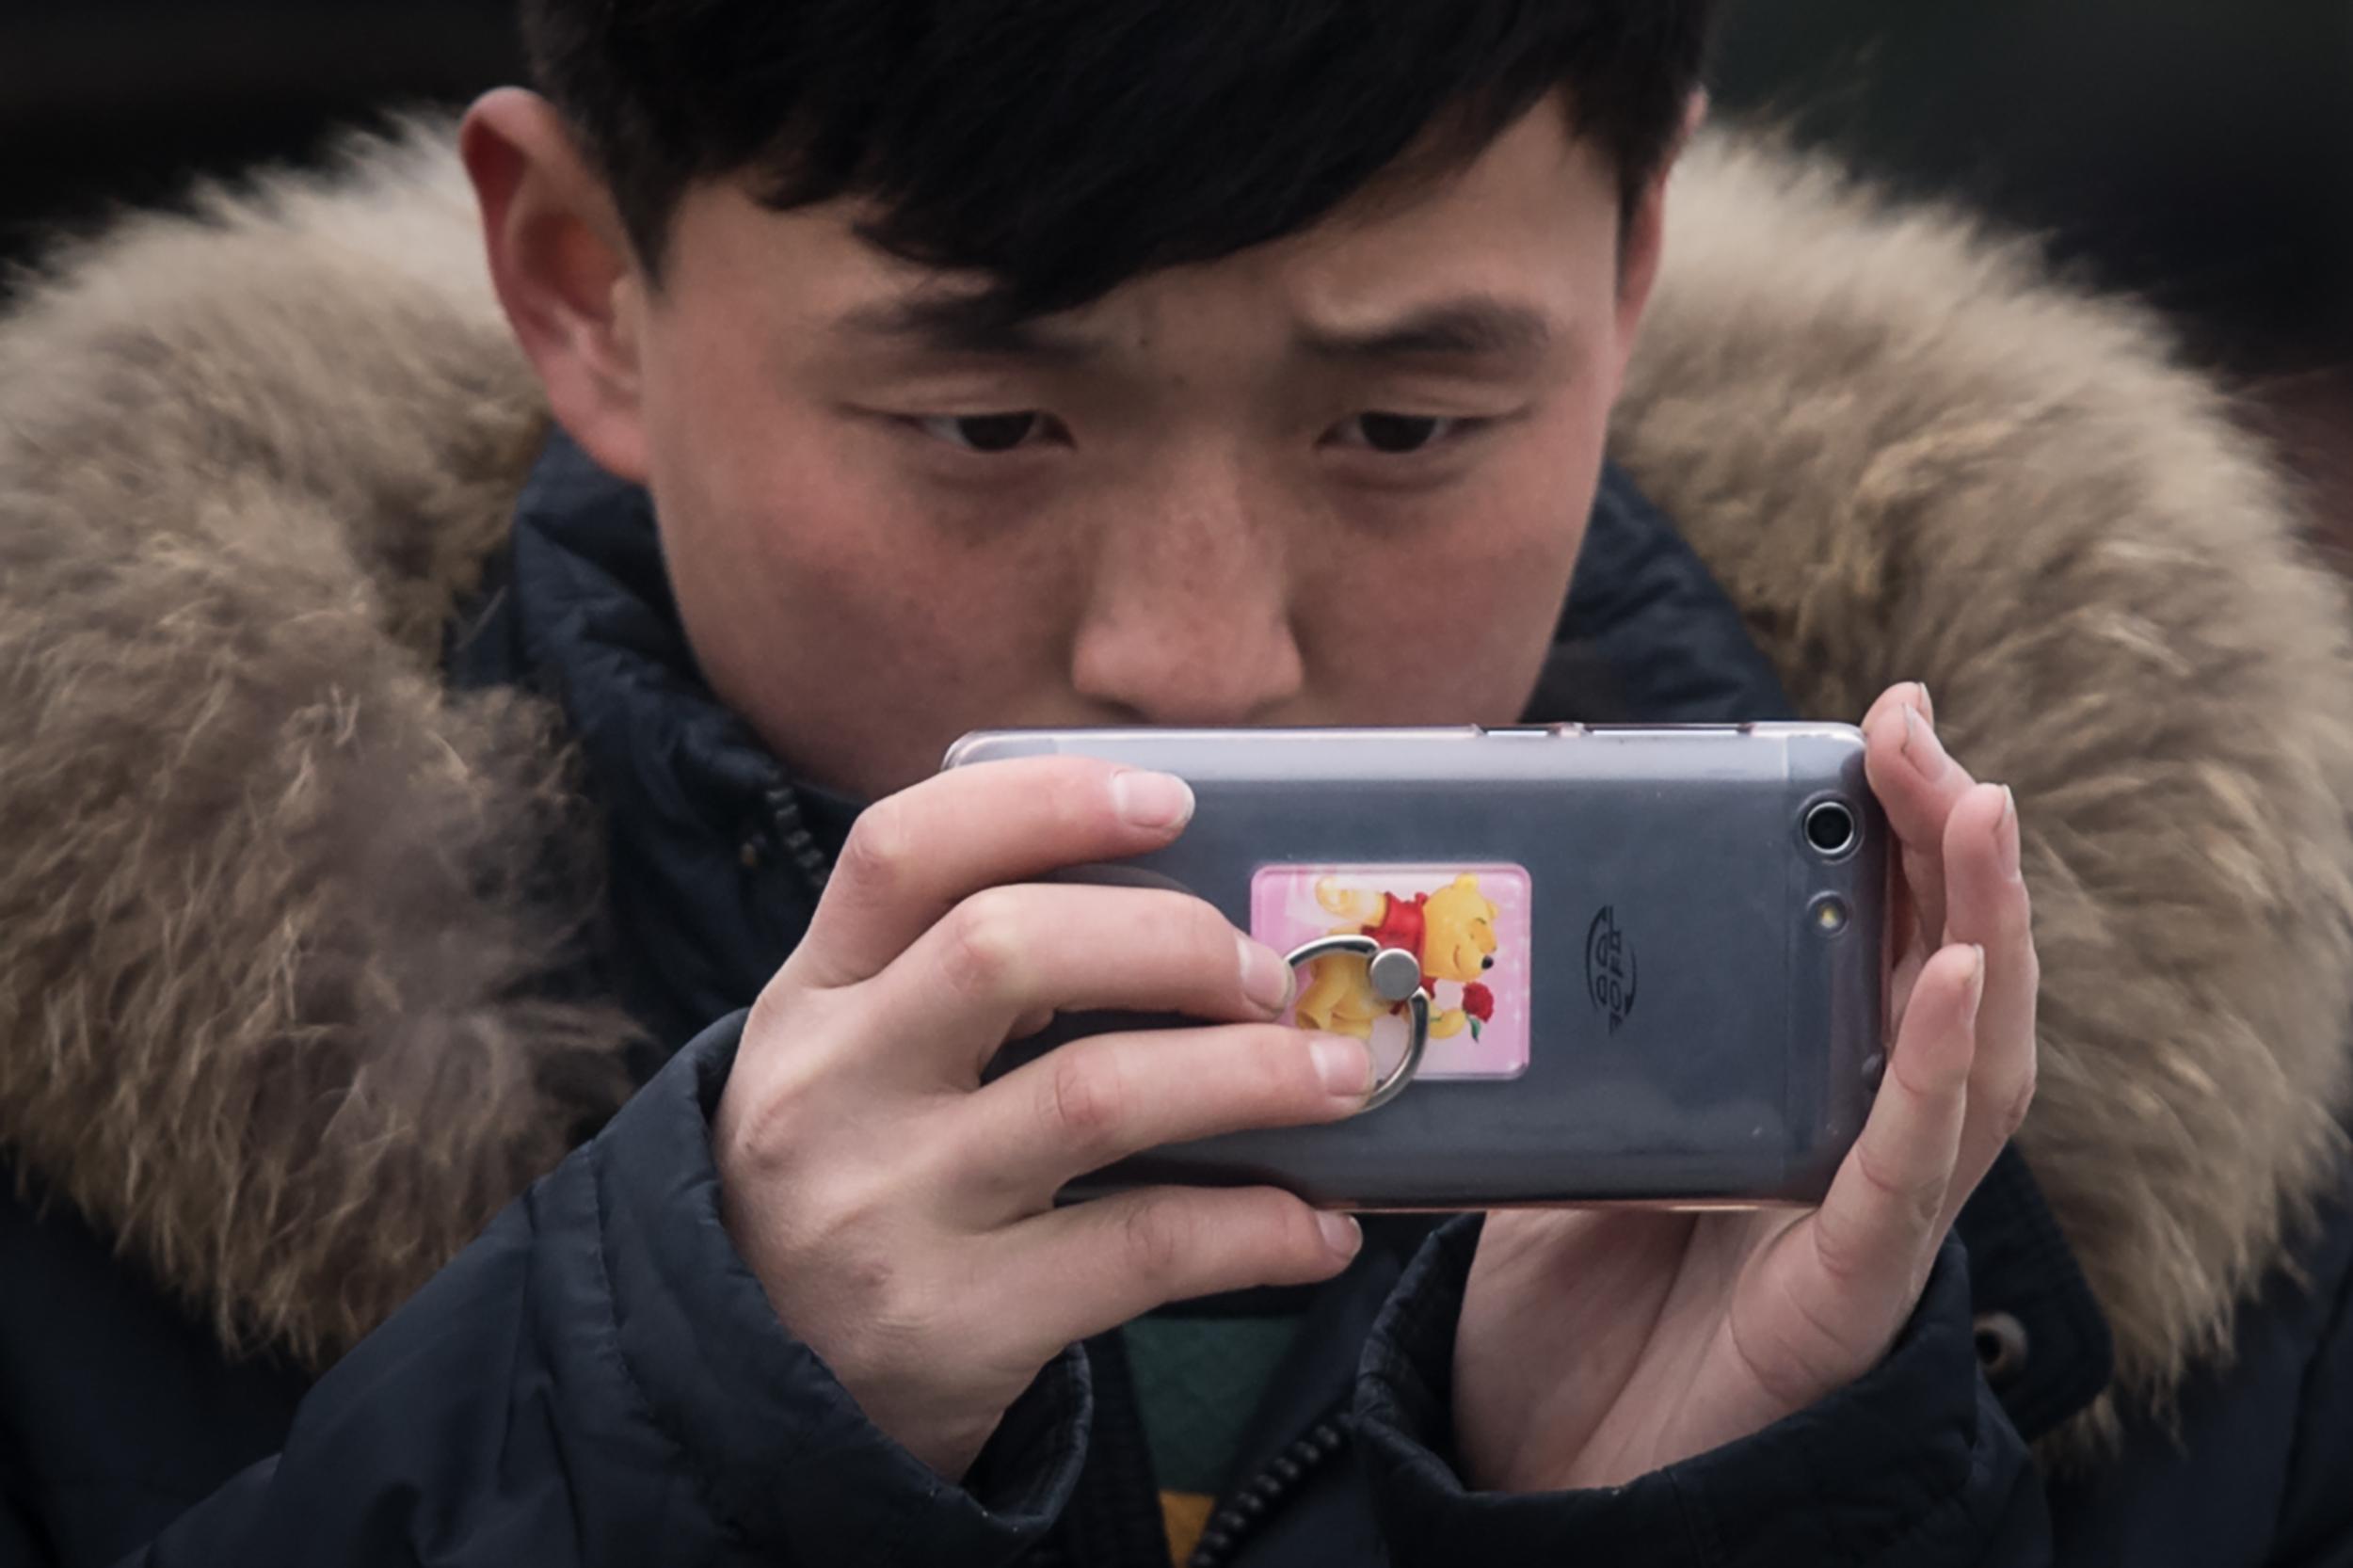 North Korea Orders Crackdown on Teenagers Storing Illegal Files on Smartphones